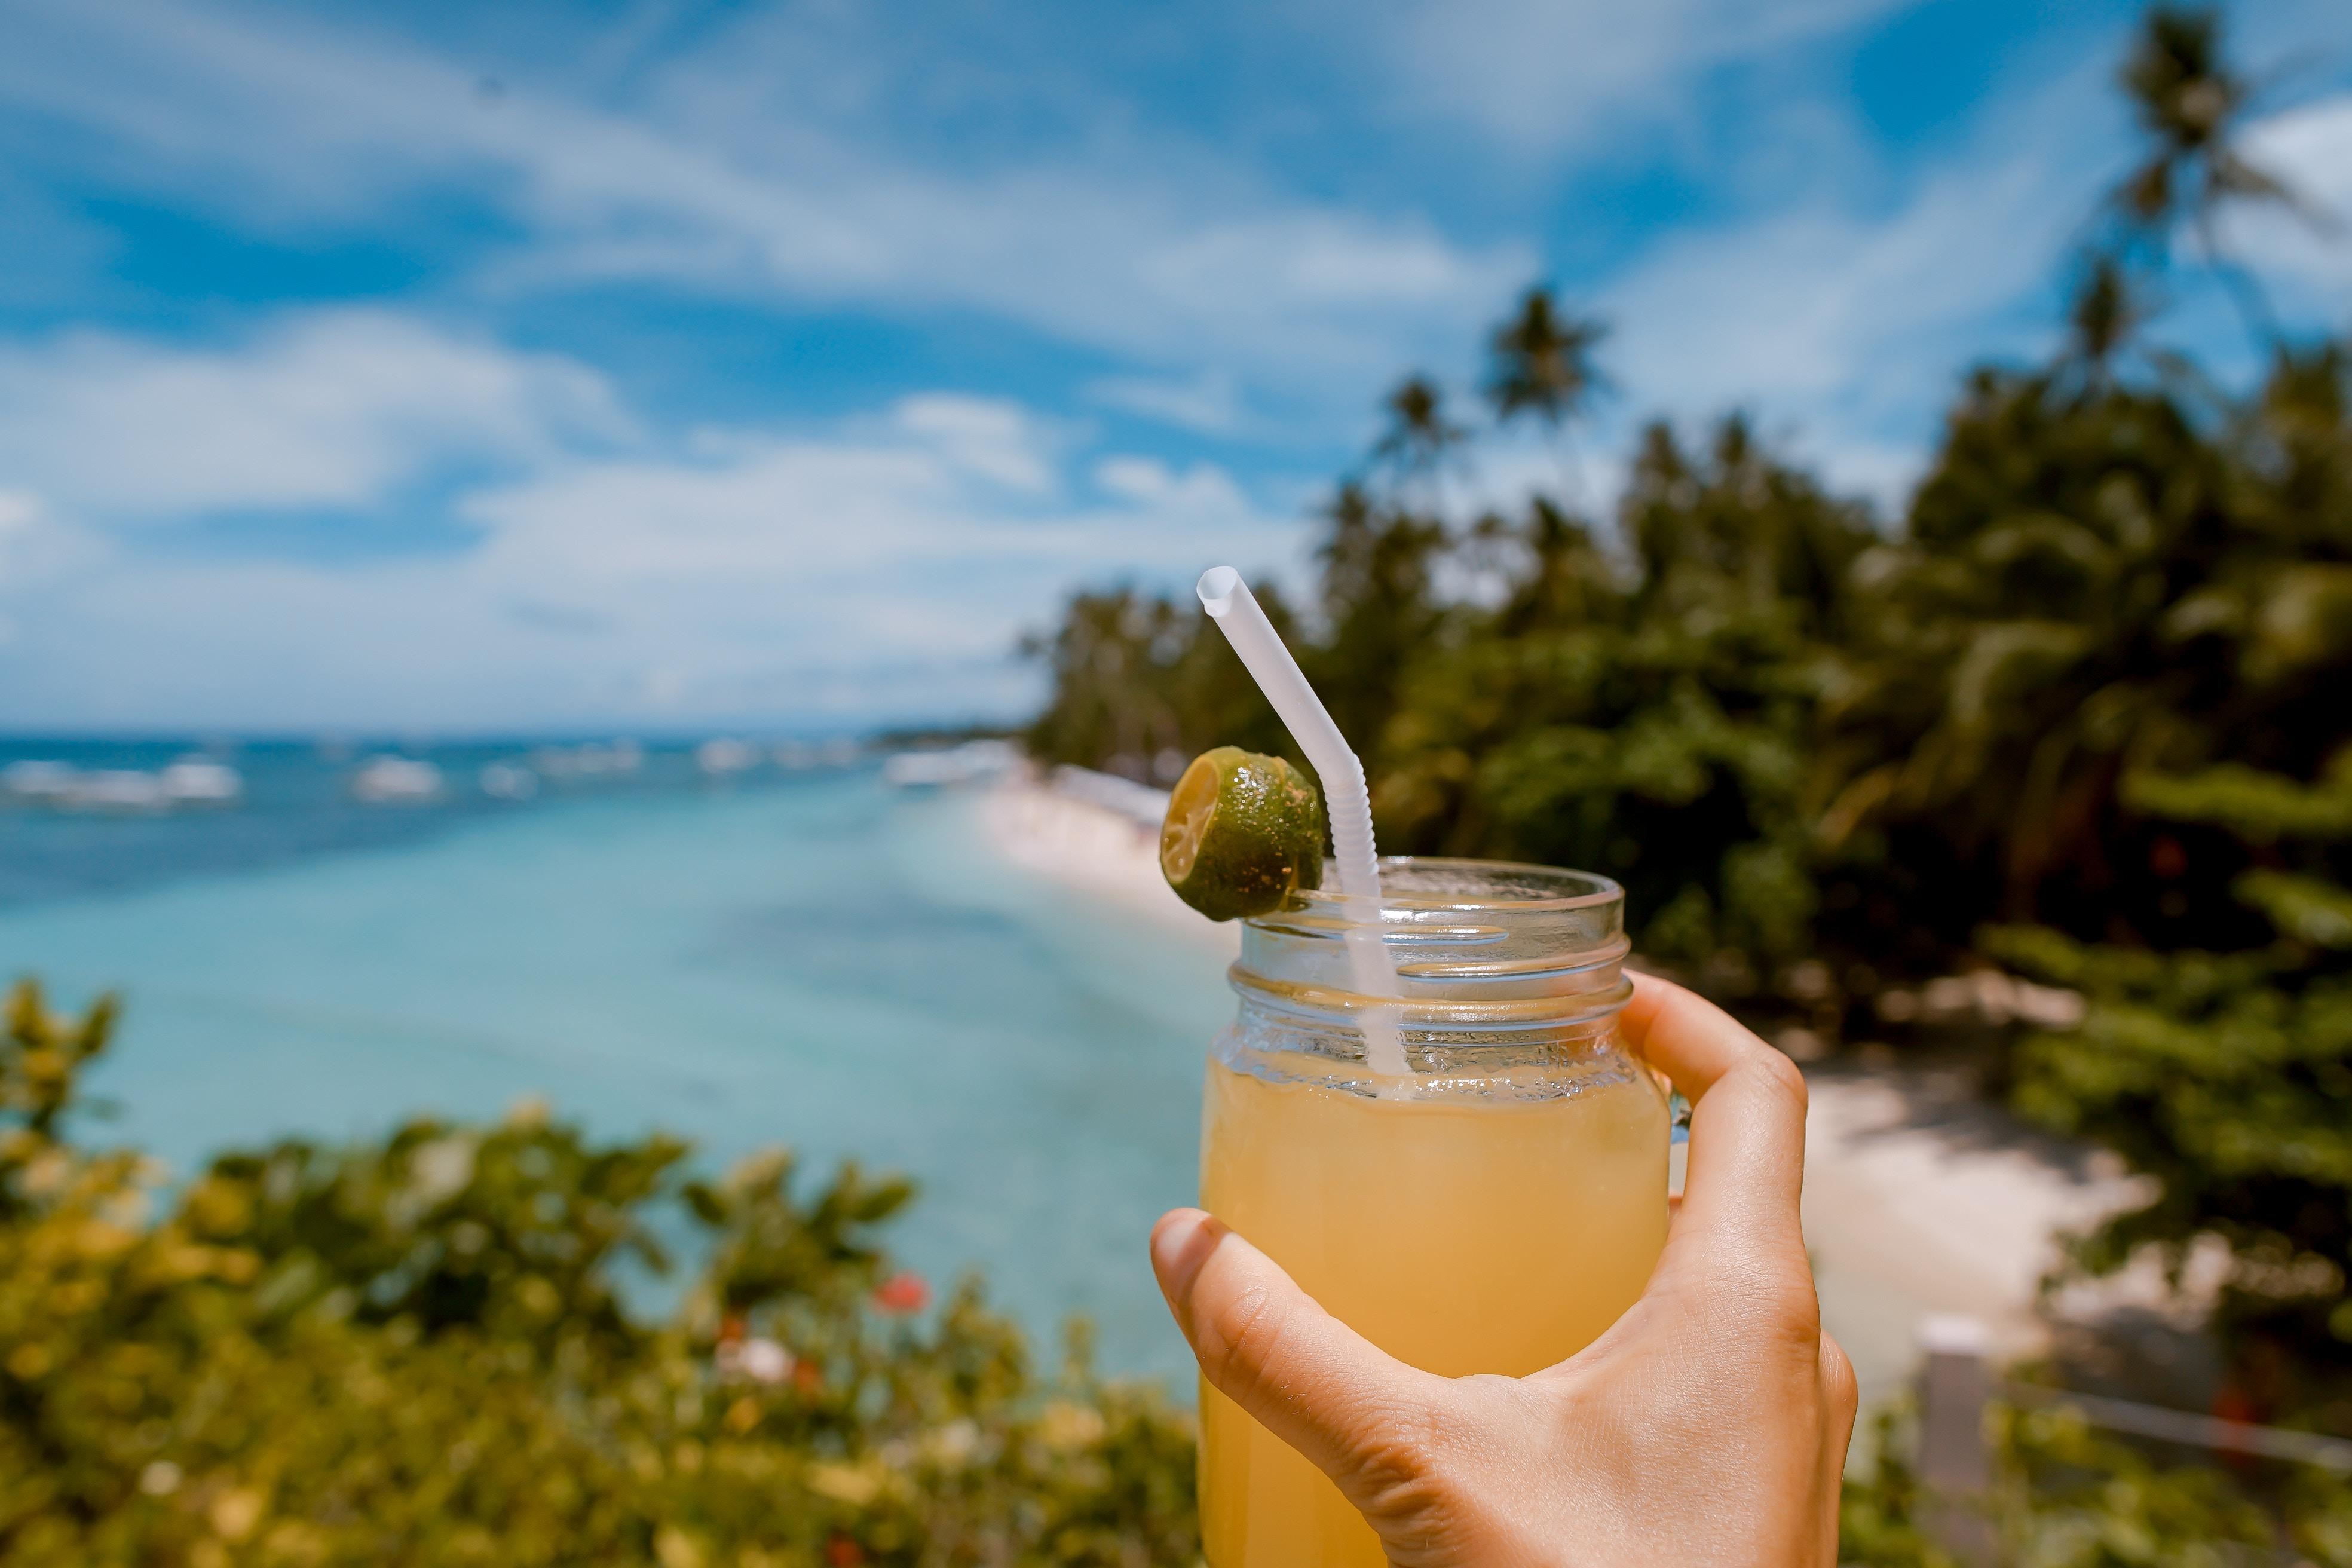 Snacks and drinks + Albatros